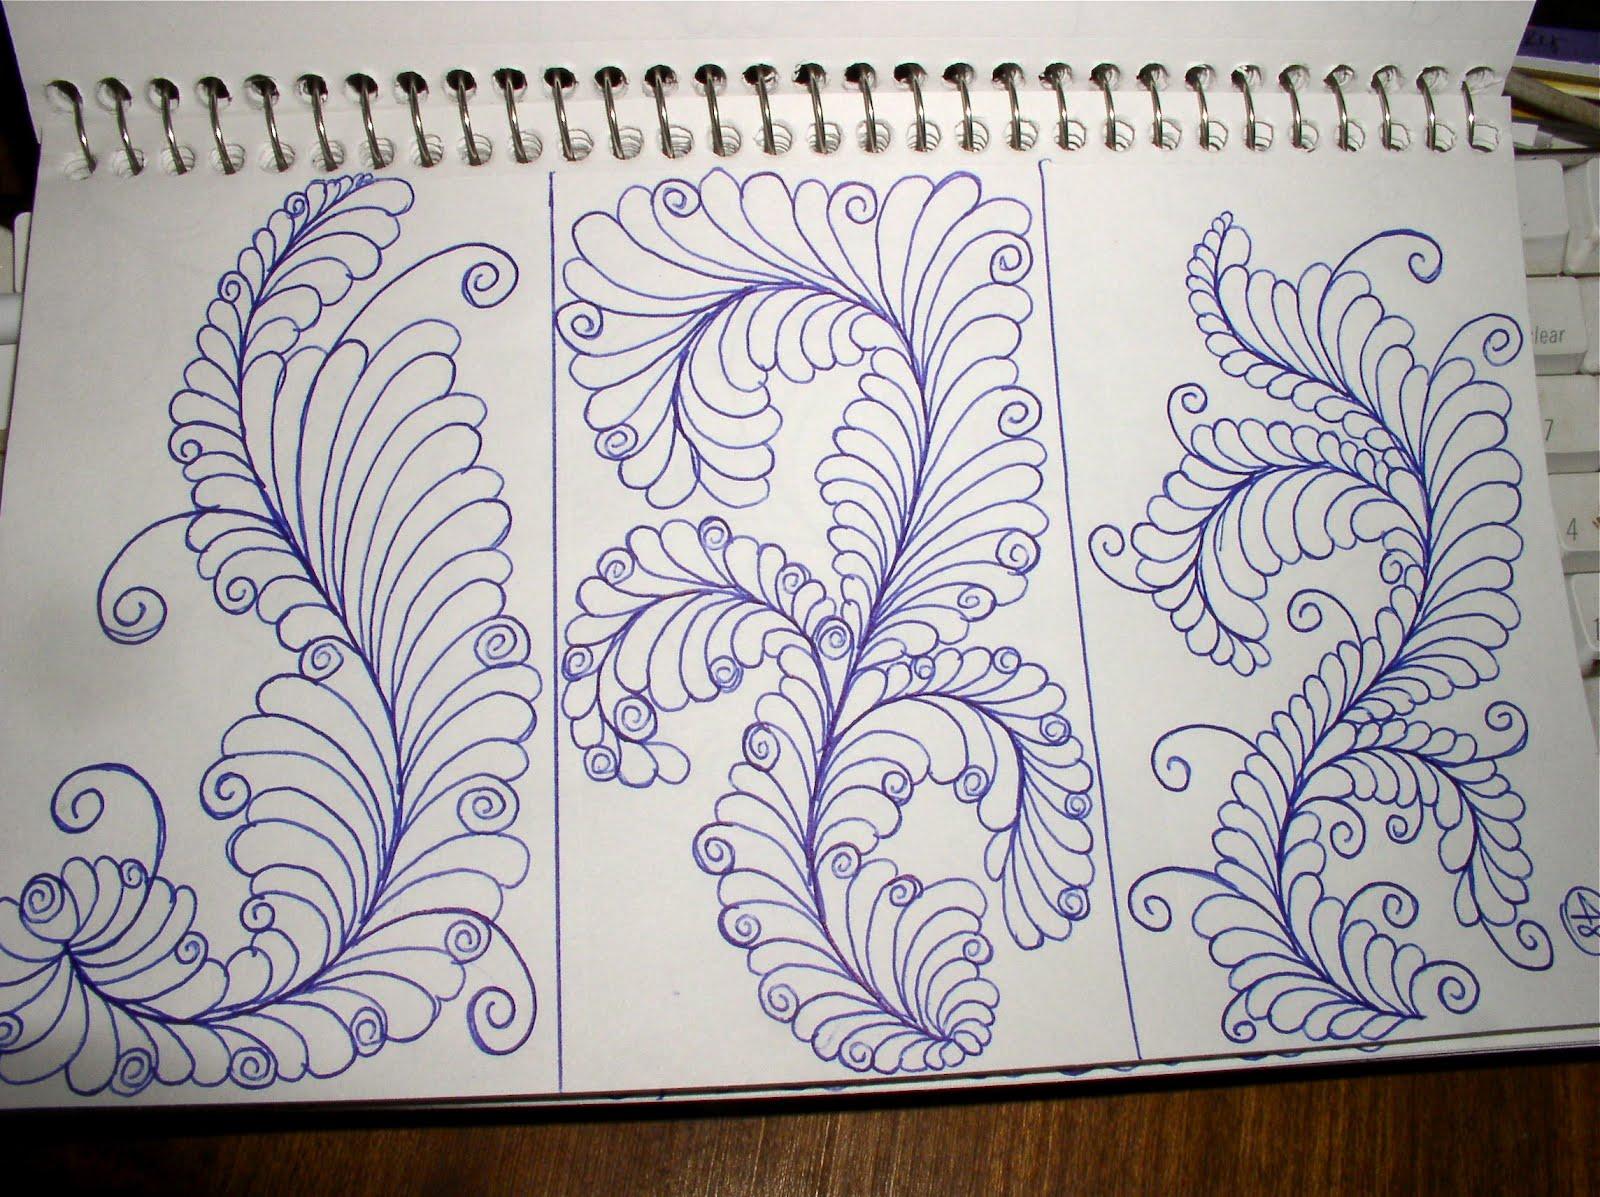 Luann Kessi Sketch Book Quilting Designs